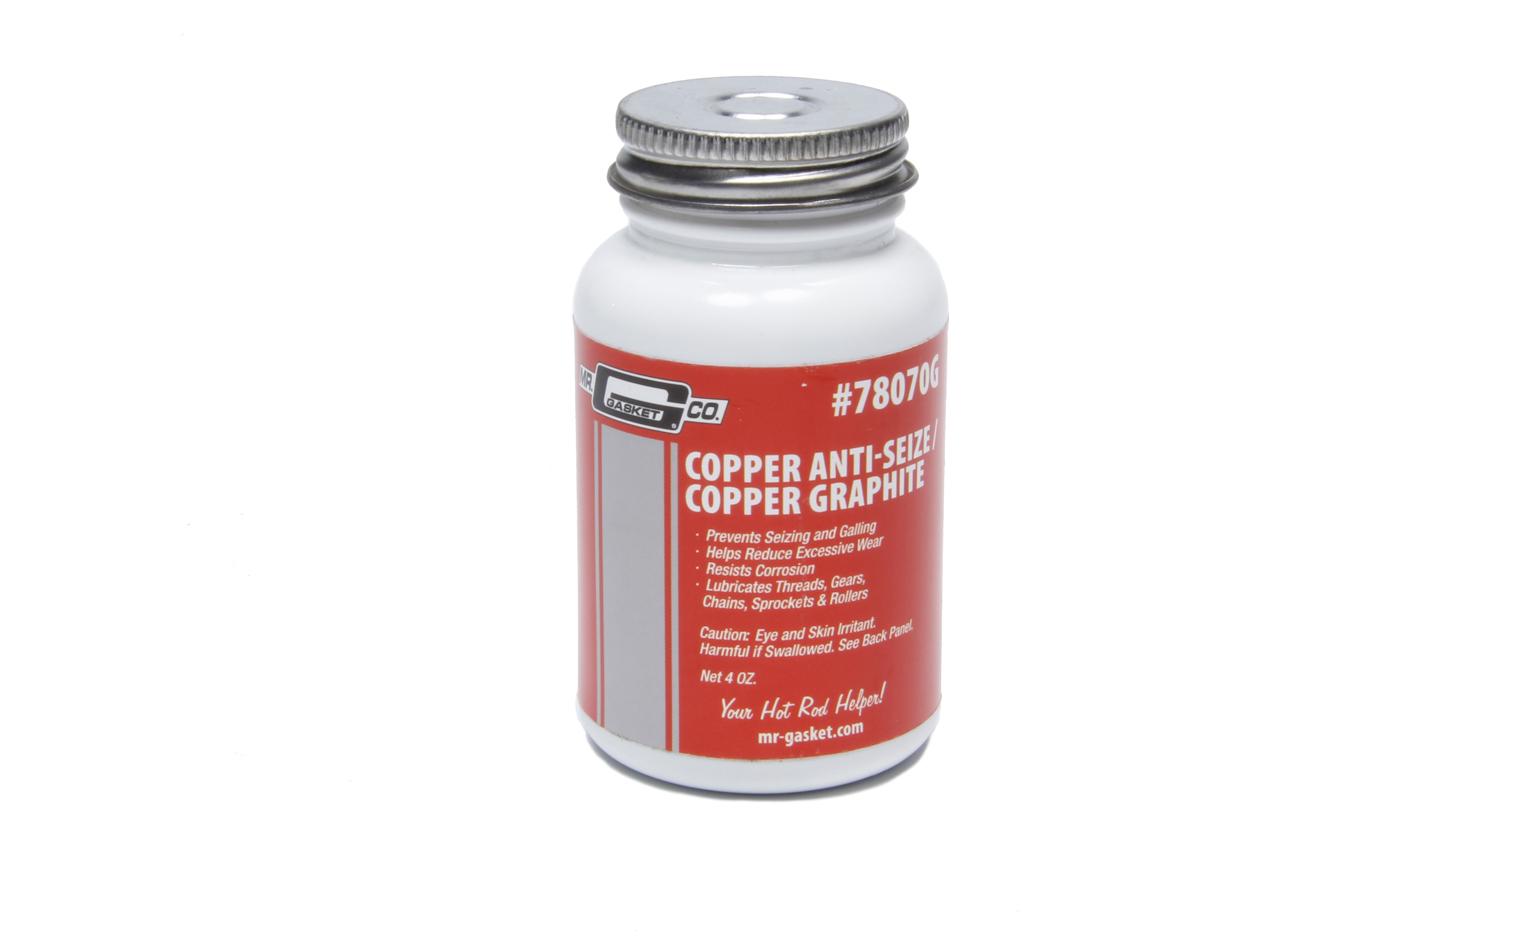 Mr. Gasket Copper Anti-Seize - 4oz Jar w/Brush